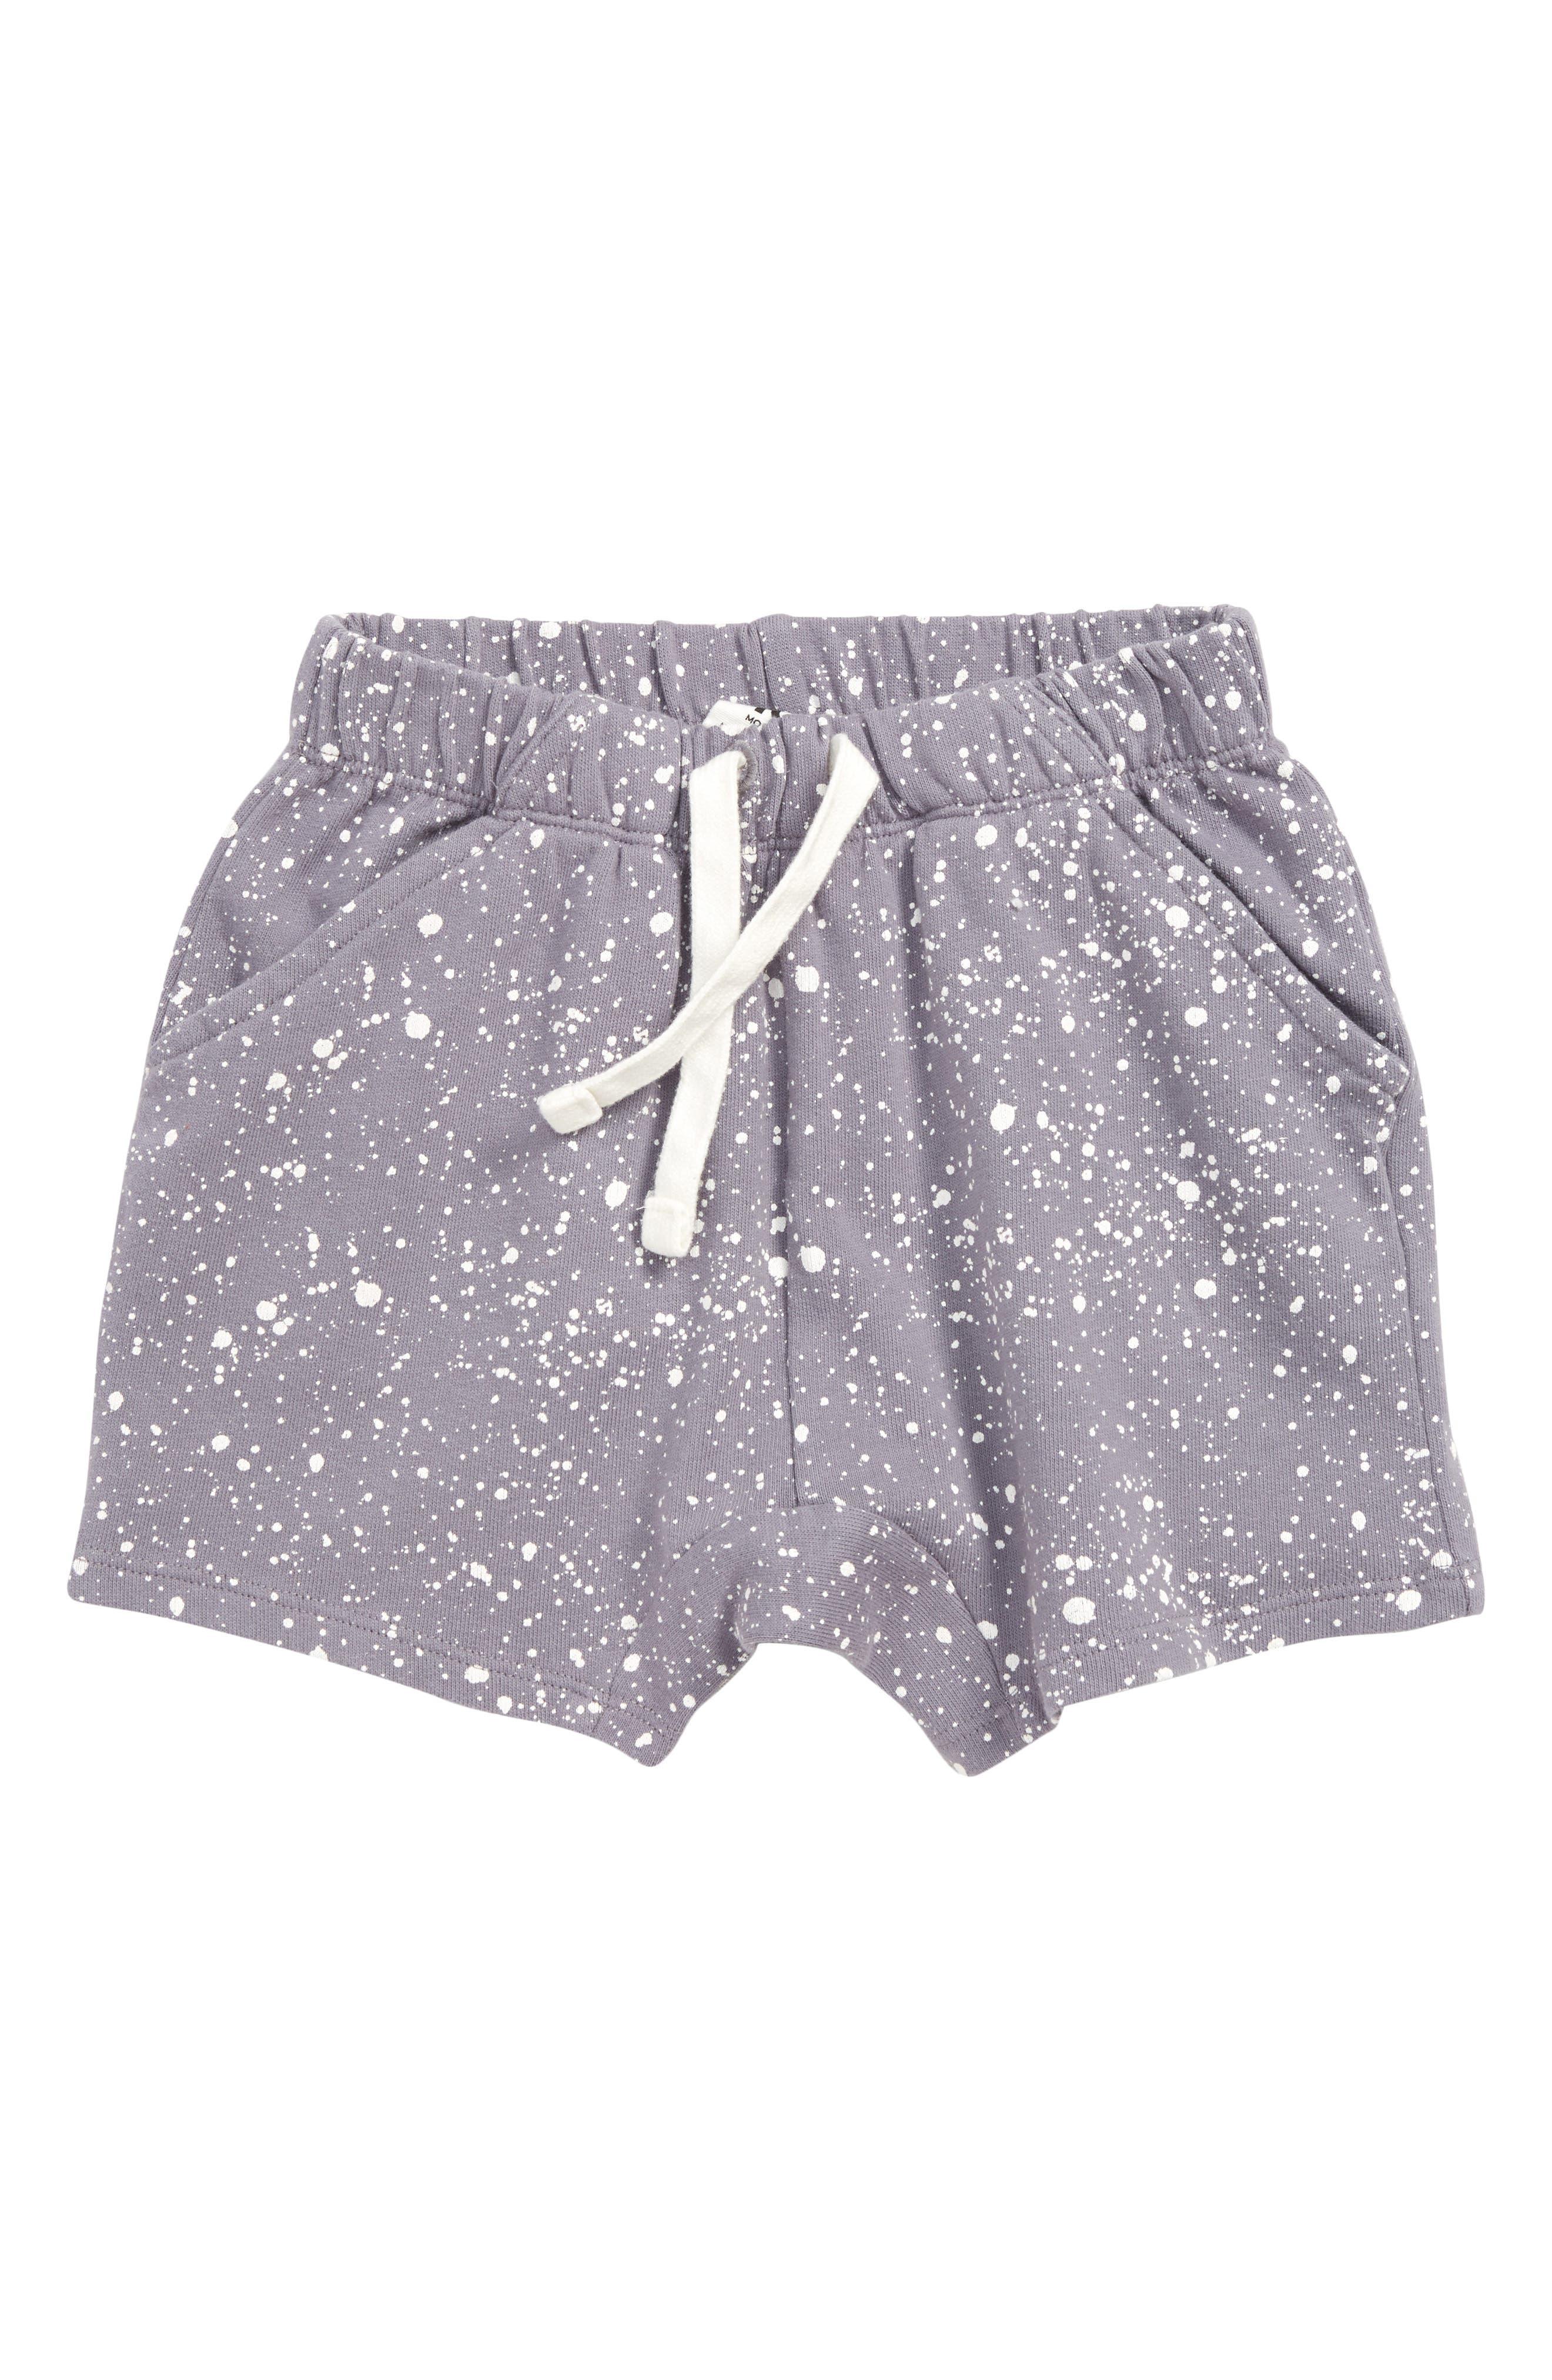 Supersoft Knit Shorts, Main, color, GREY QUICK SPLATTER